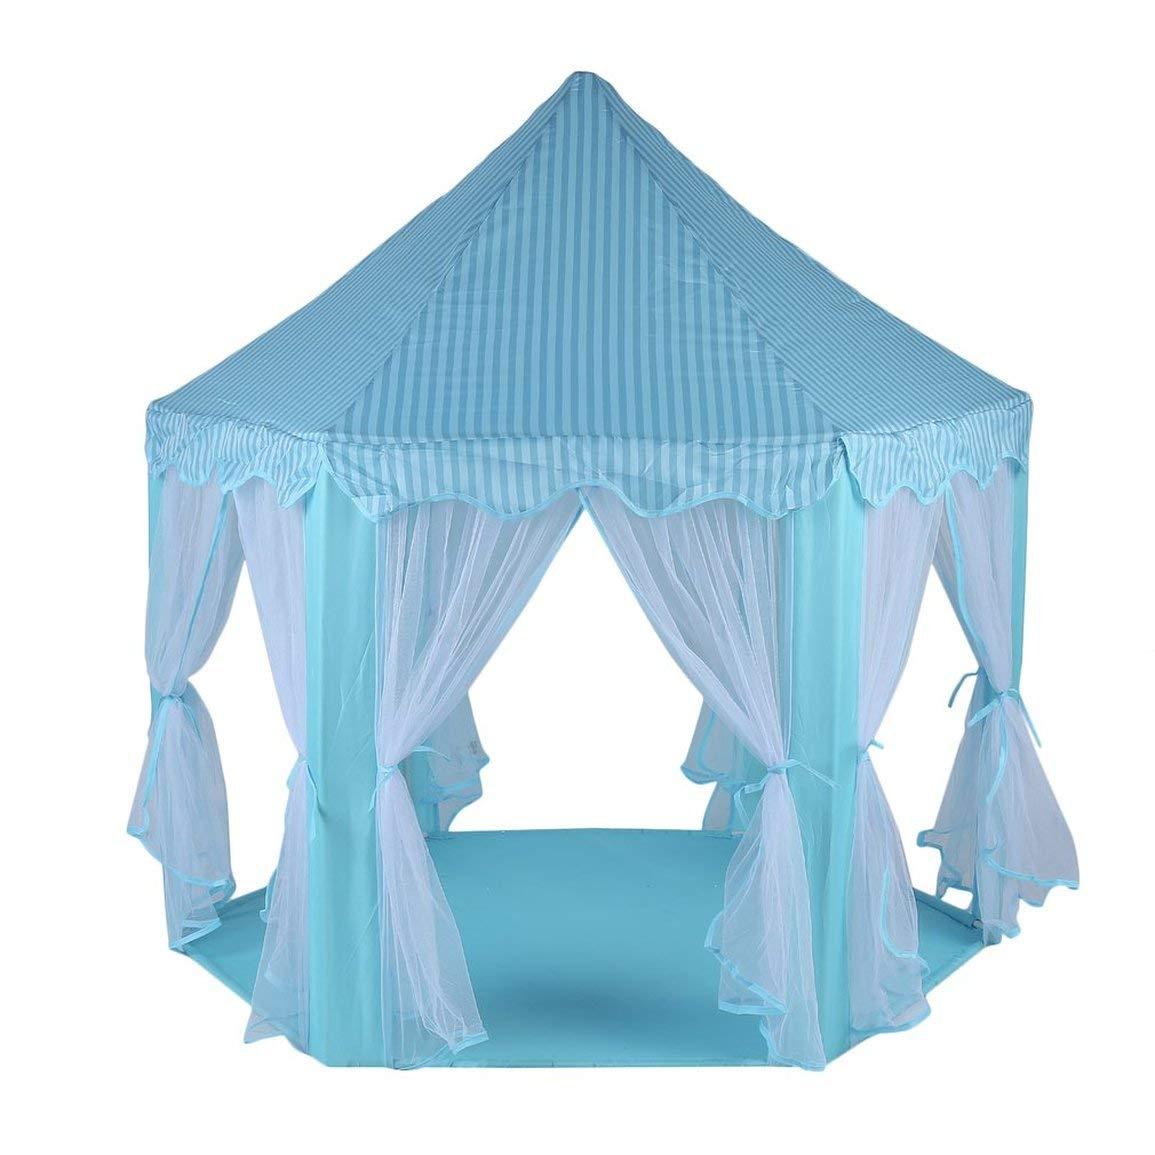 Faltbare Design Kinder Kinder-Spiel-Zelt großen Raum Wasserdicht Fest Farbe Kinder Castle Cubby Play House